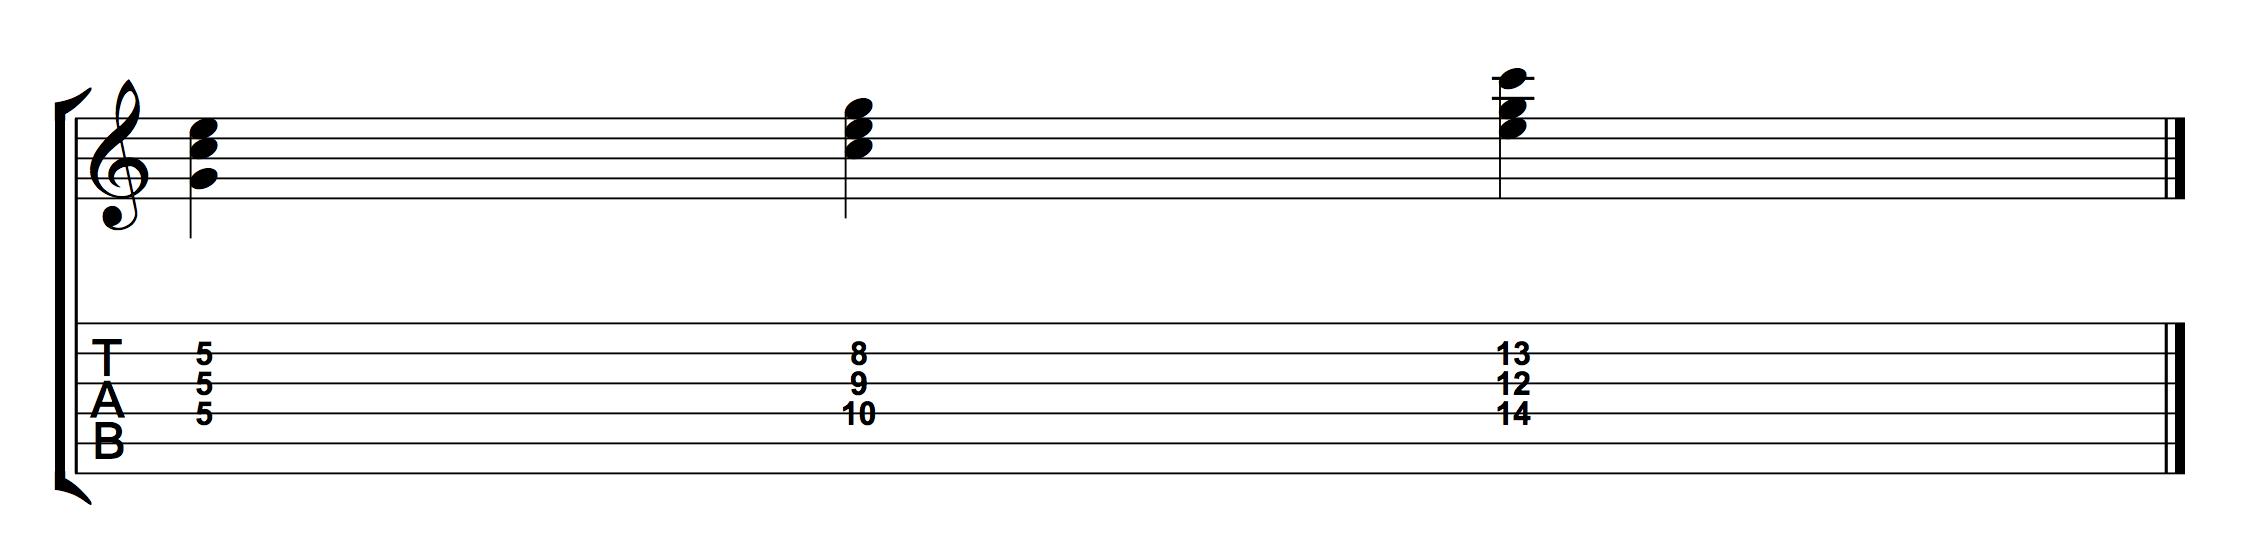 C Major Triad 3 Shapes 234